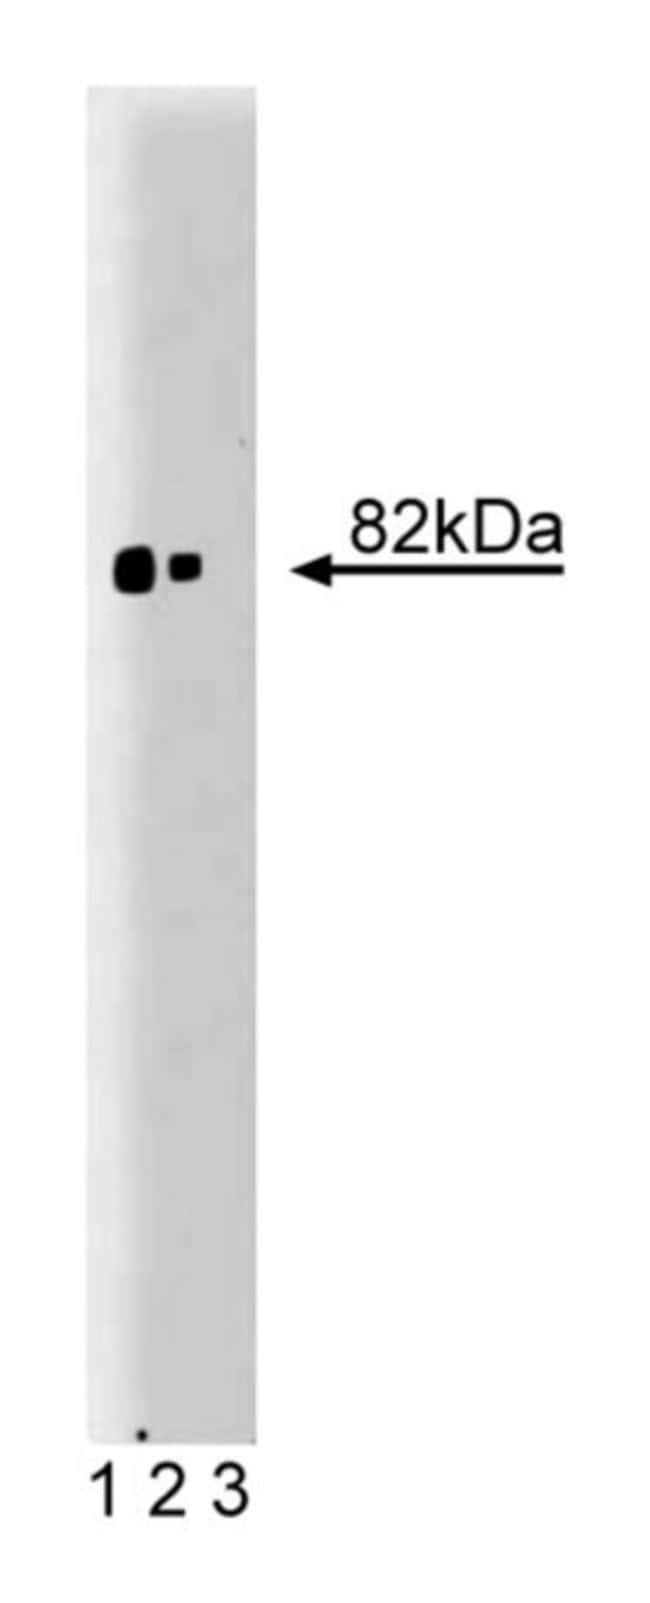 PKCα Mouse, Unlabeled, Clone: 3/PKC, BD 150μg; Unlabeled PKCα Mouse, Unlabeled, Clone: 3/PKC, BD